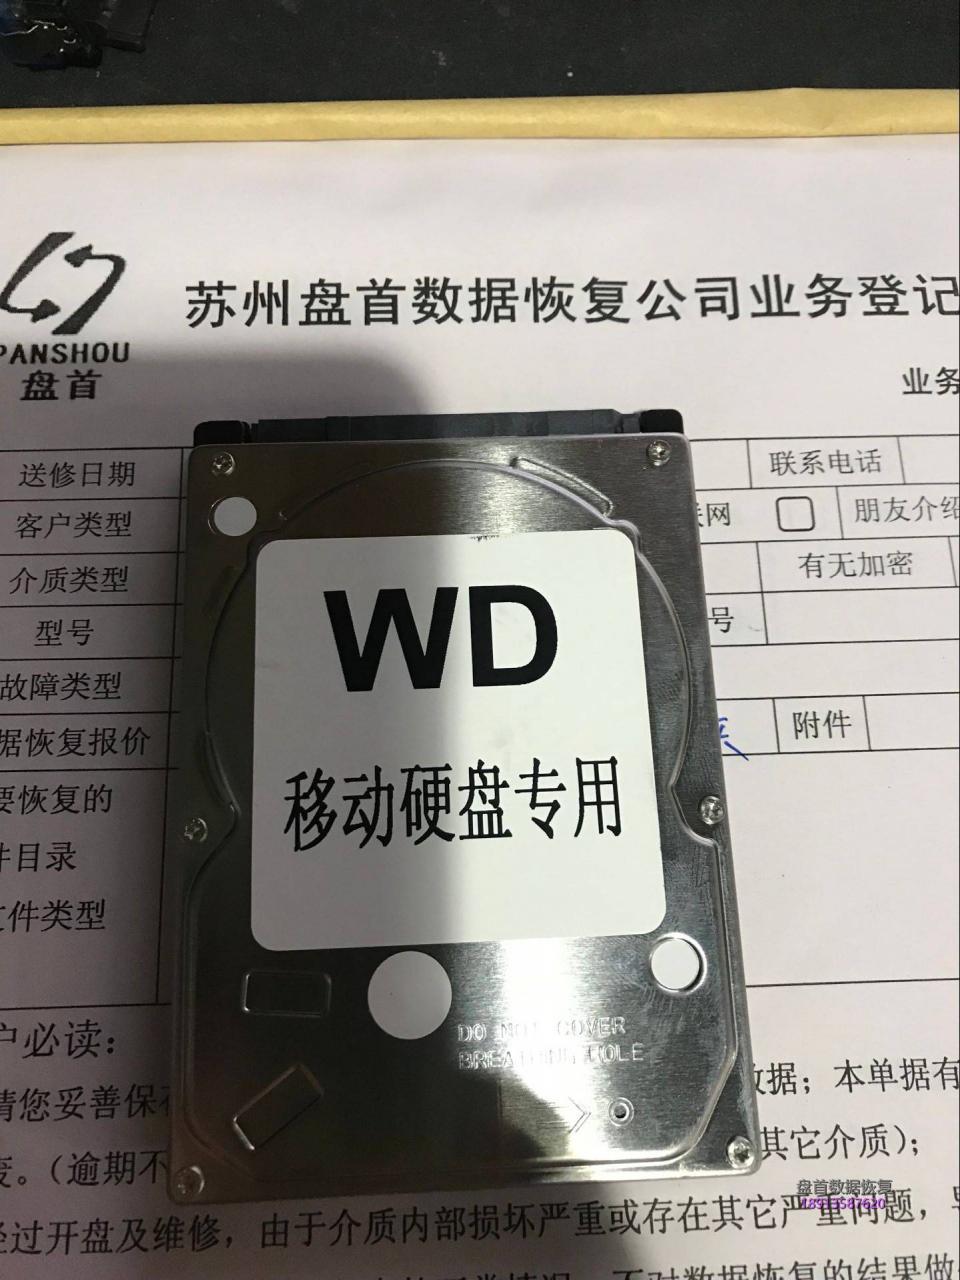 WD西部数据假原装移动硬盘里拆出来一个东芝笔记本硬盘磁头损坏开盘数据恢复成功